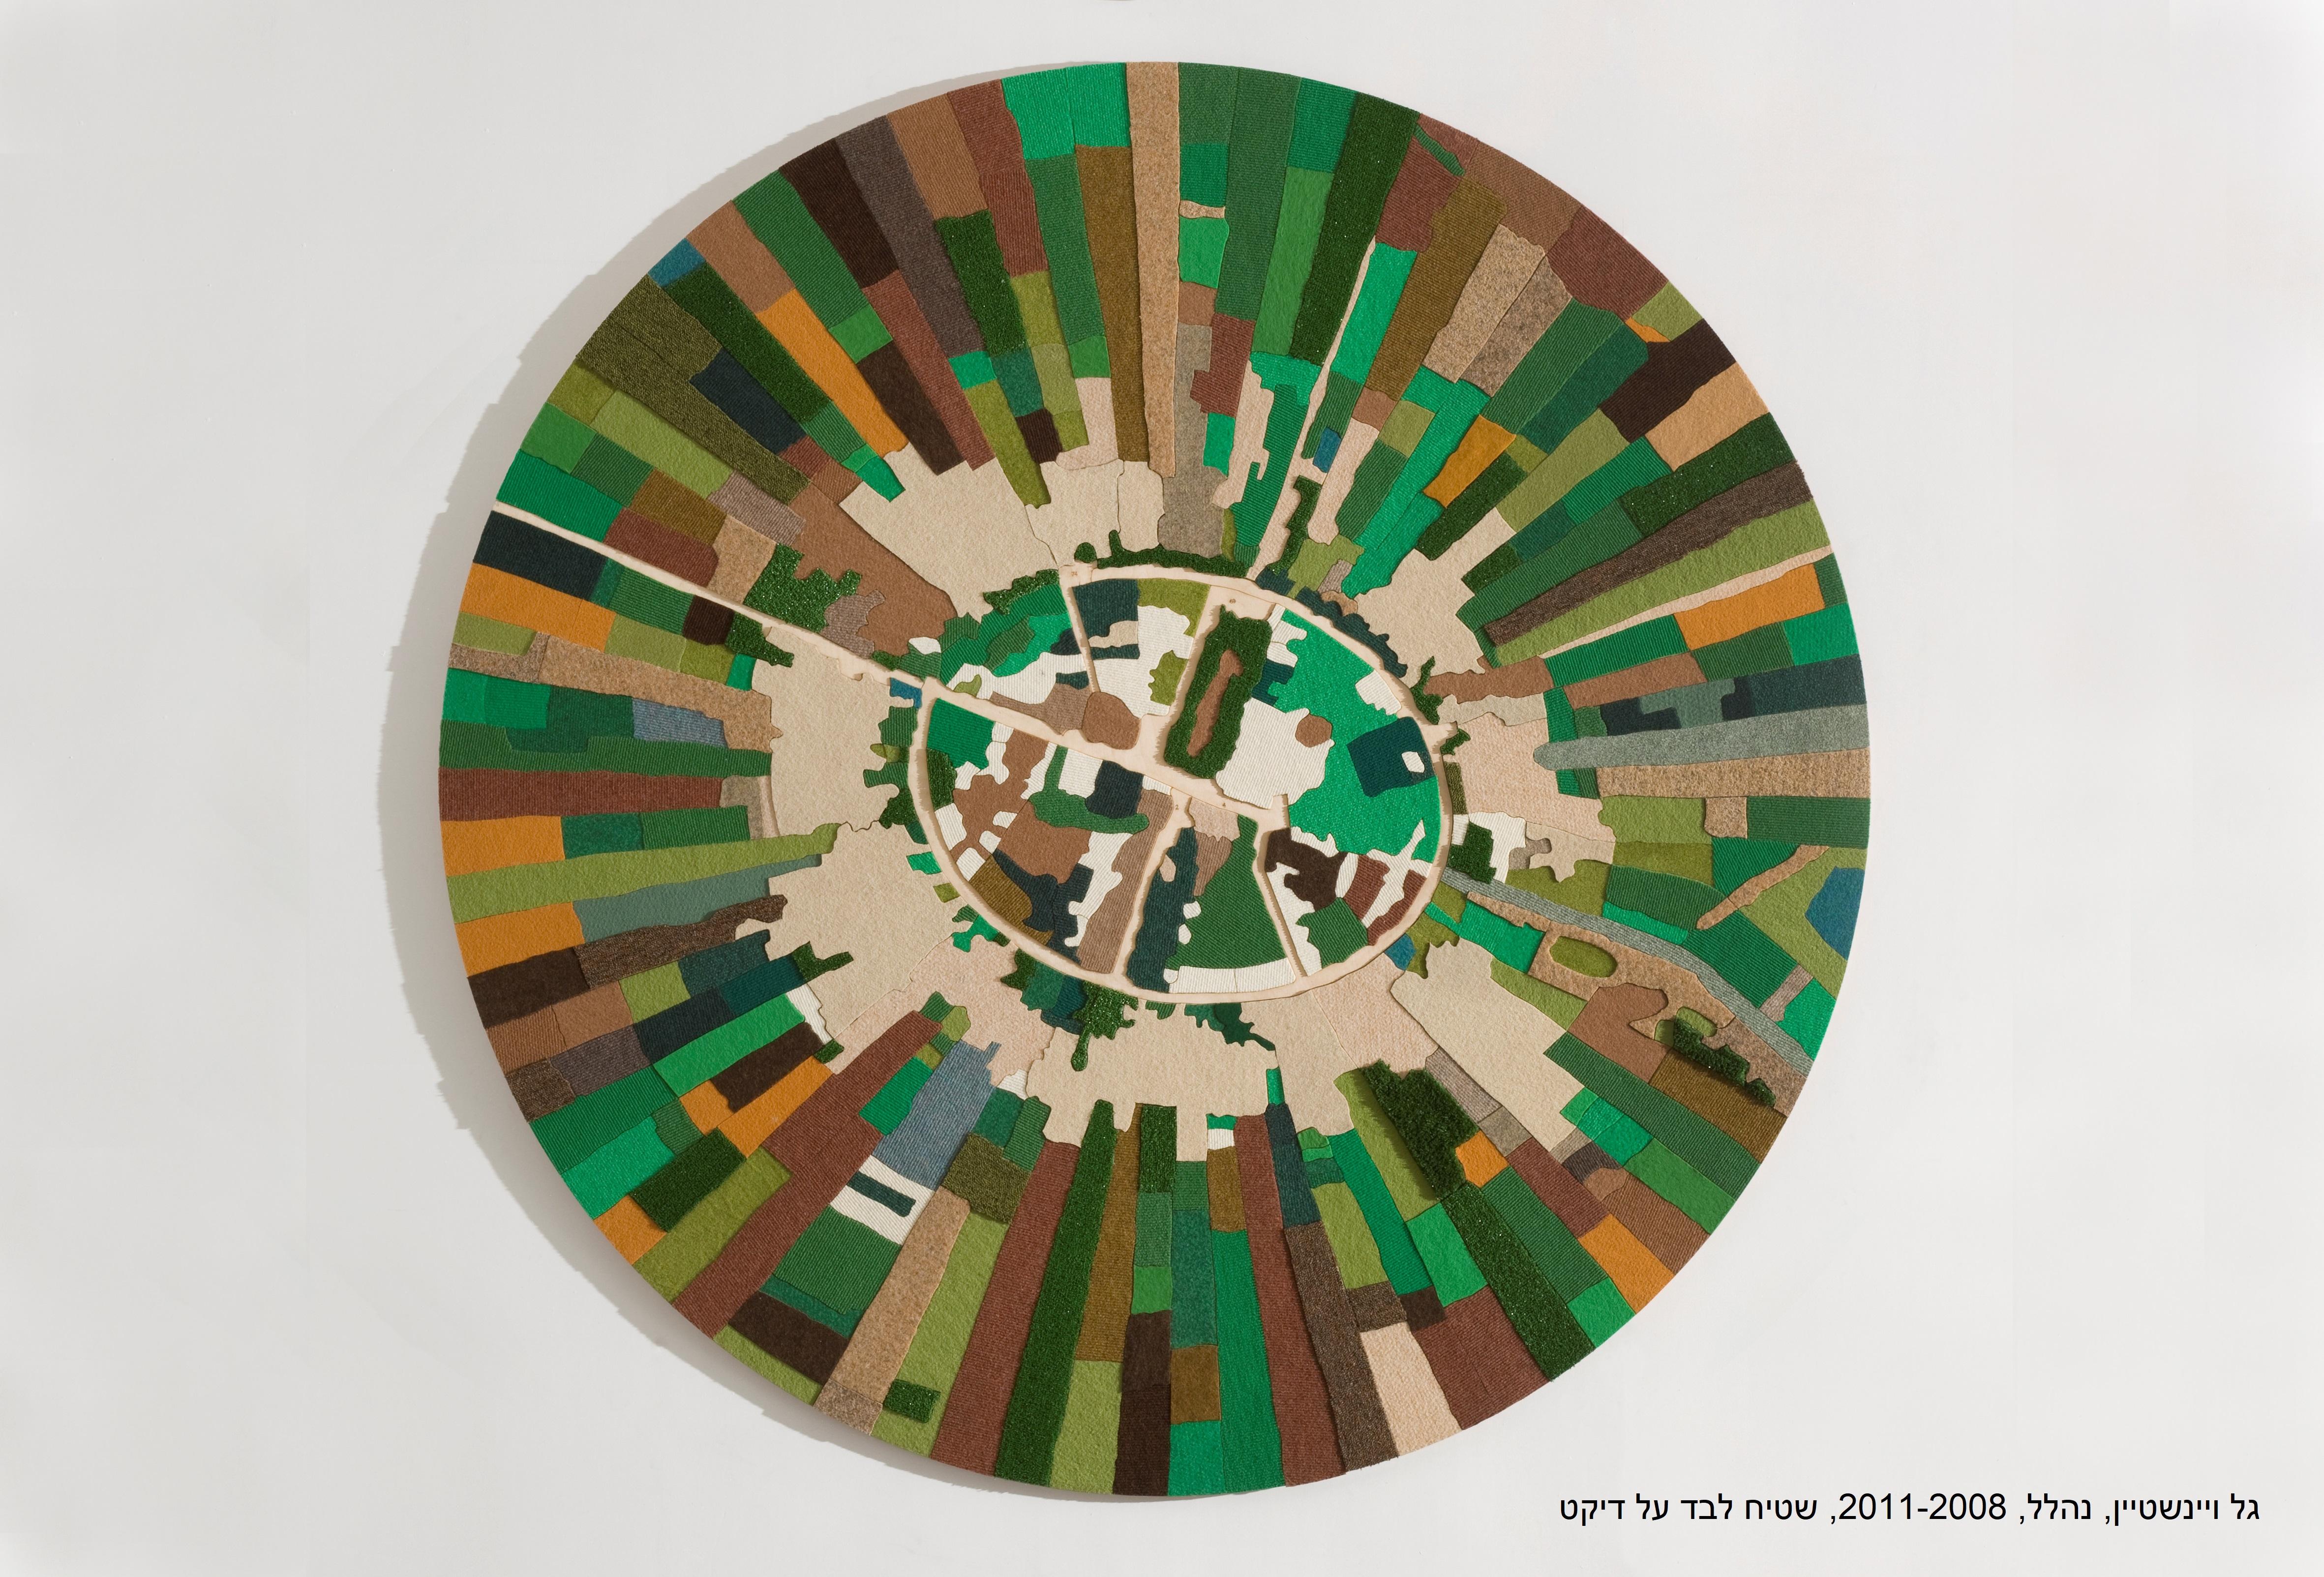 גל וינשטיין, נהלל, קוטר 120, 2008-2011ן.